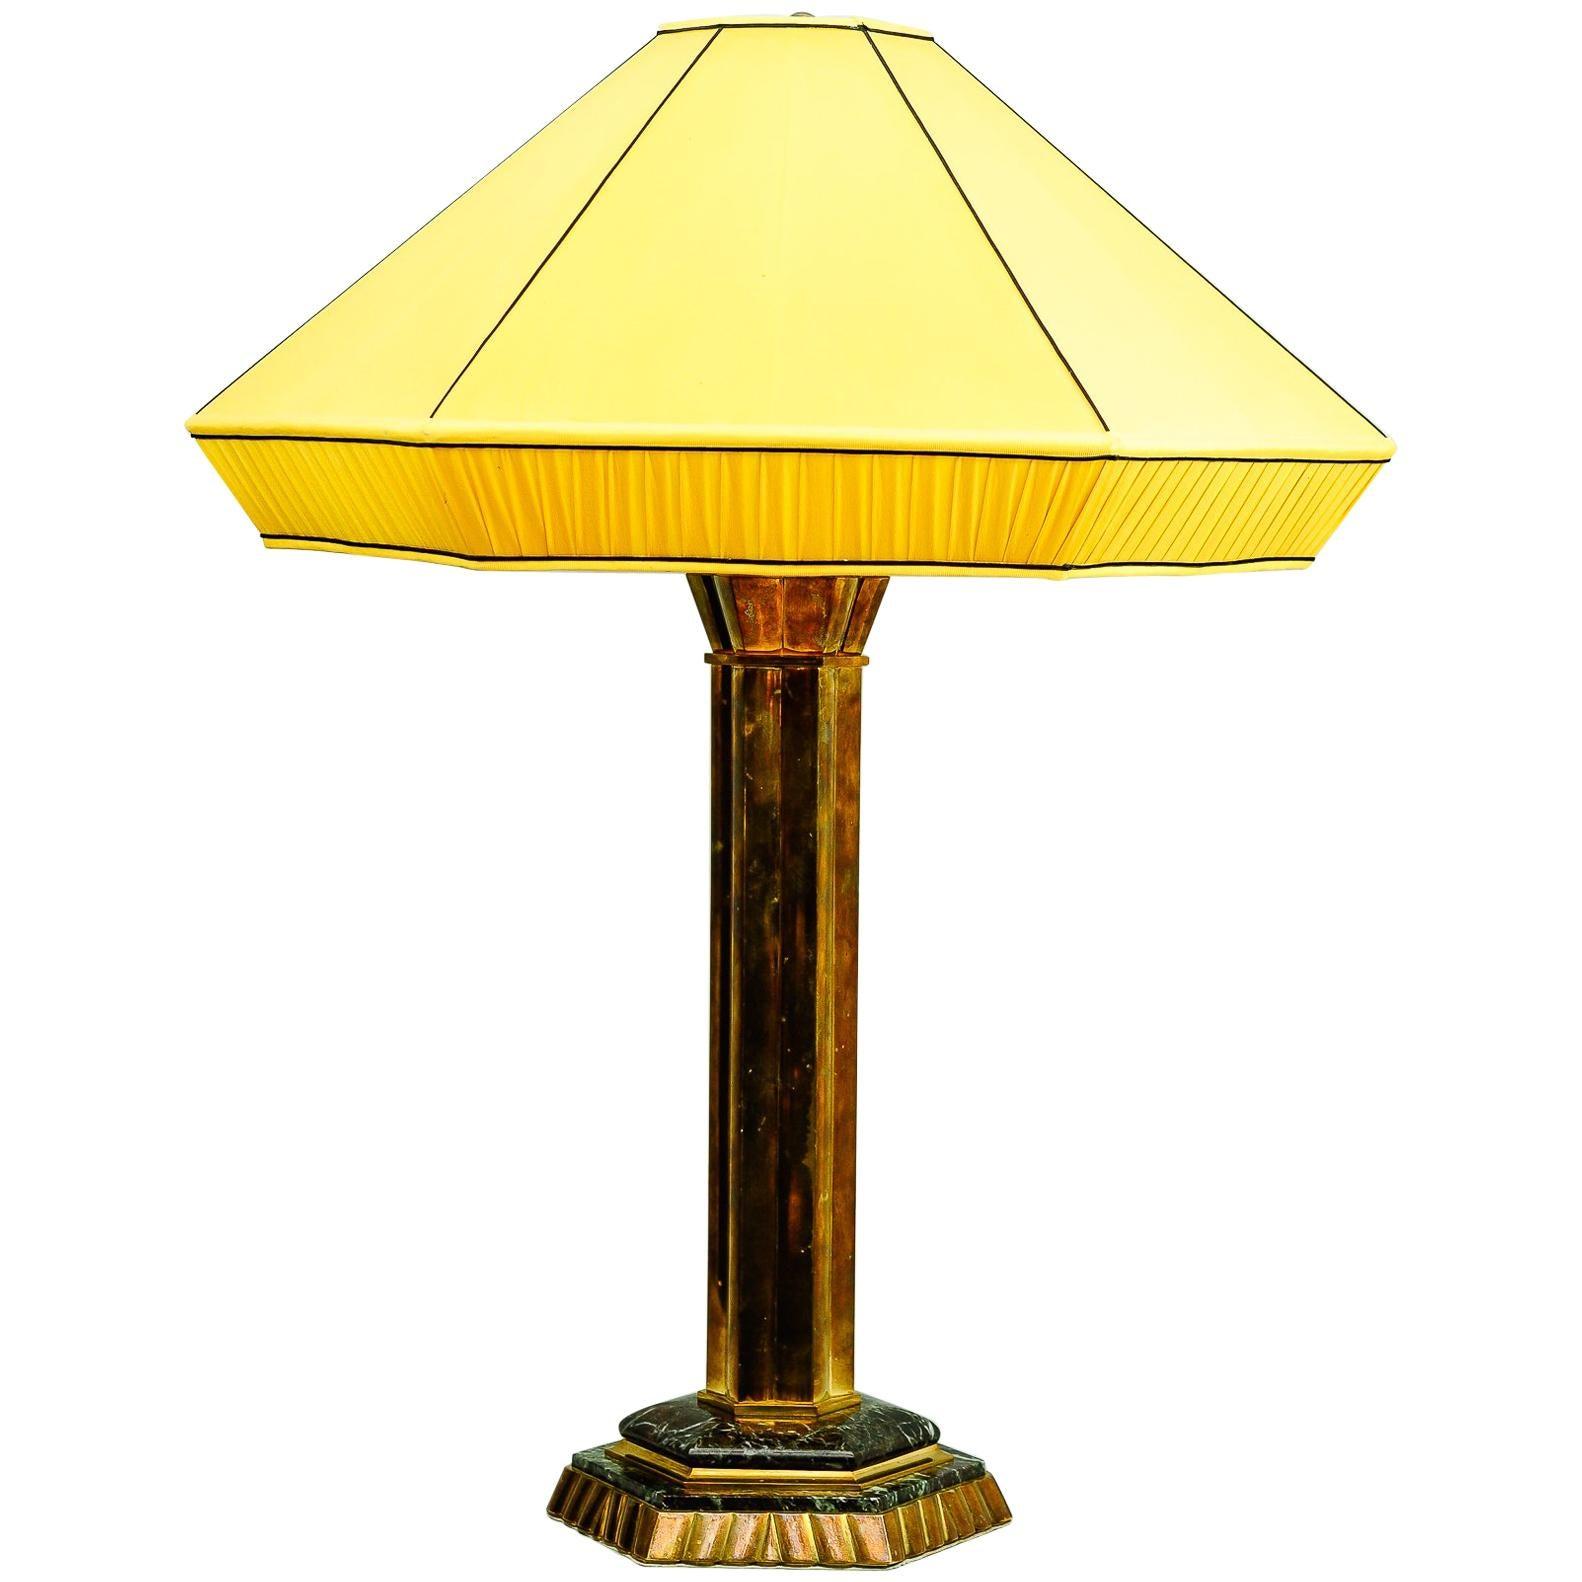 Huge Art Deco Table Lamp, Austria, 1920s